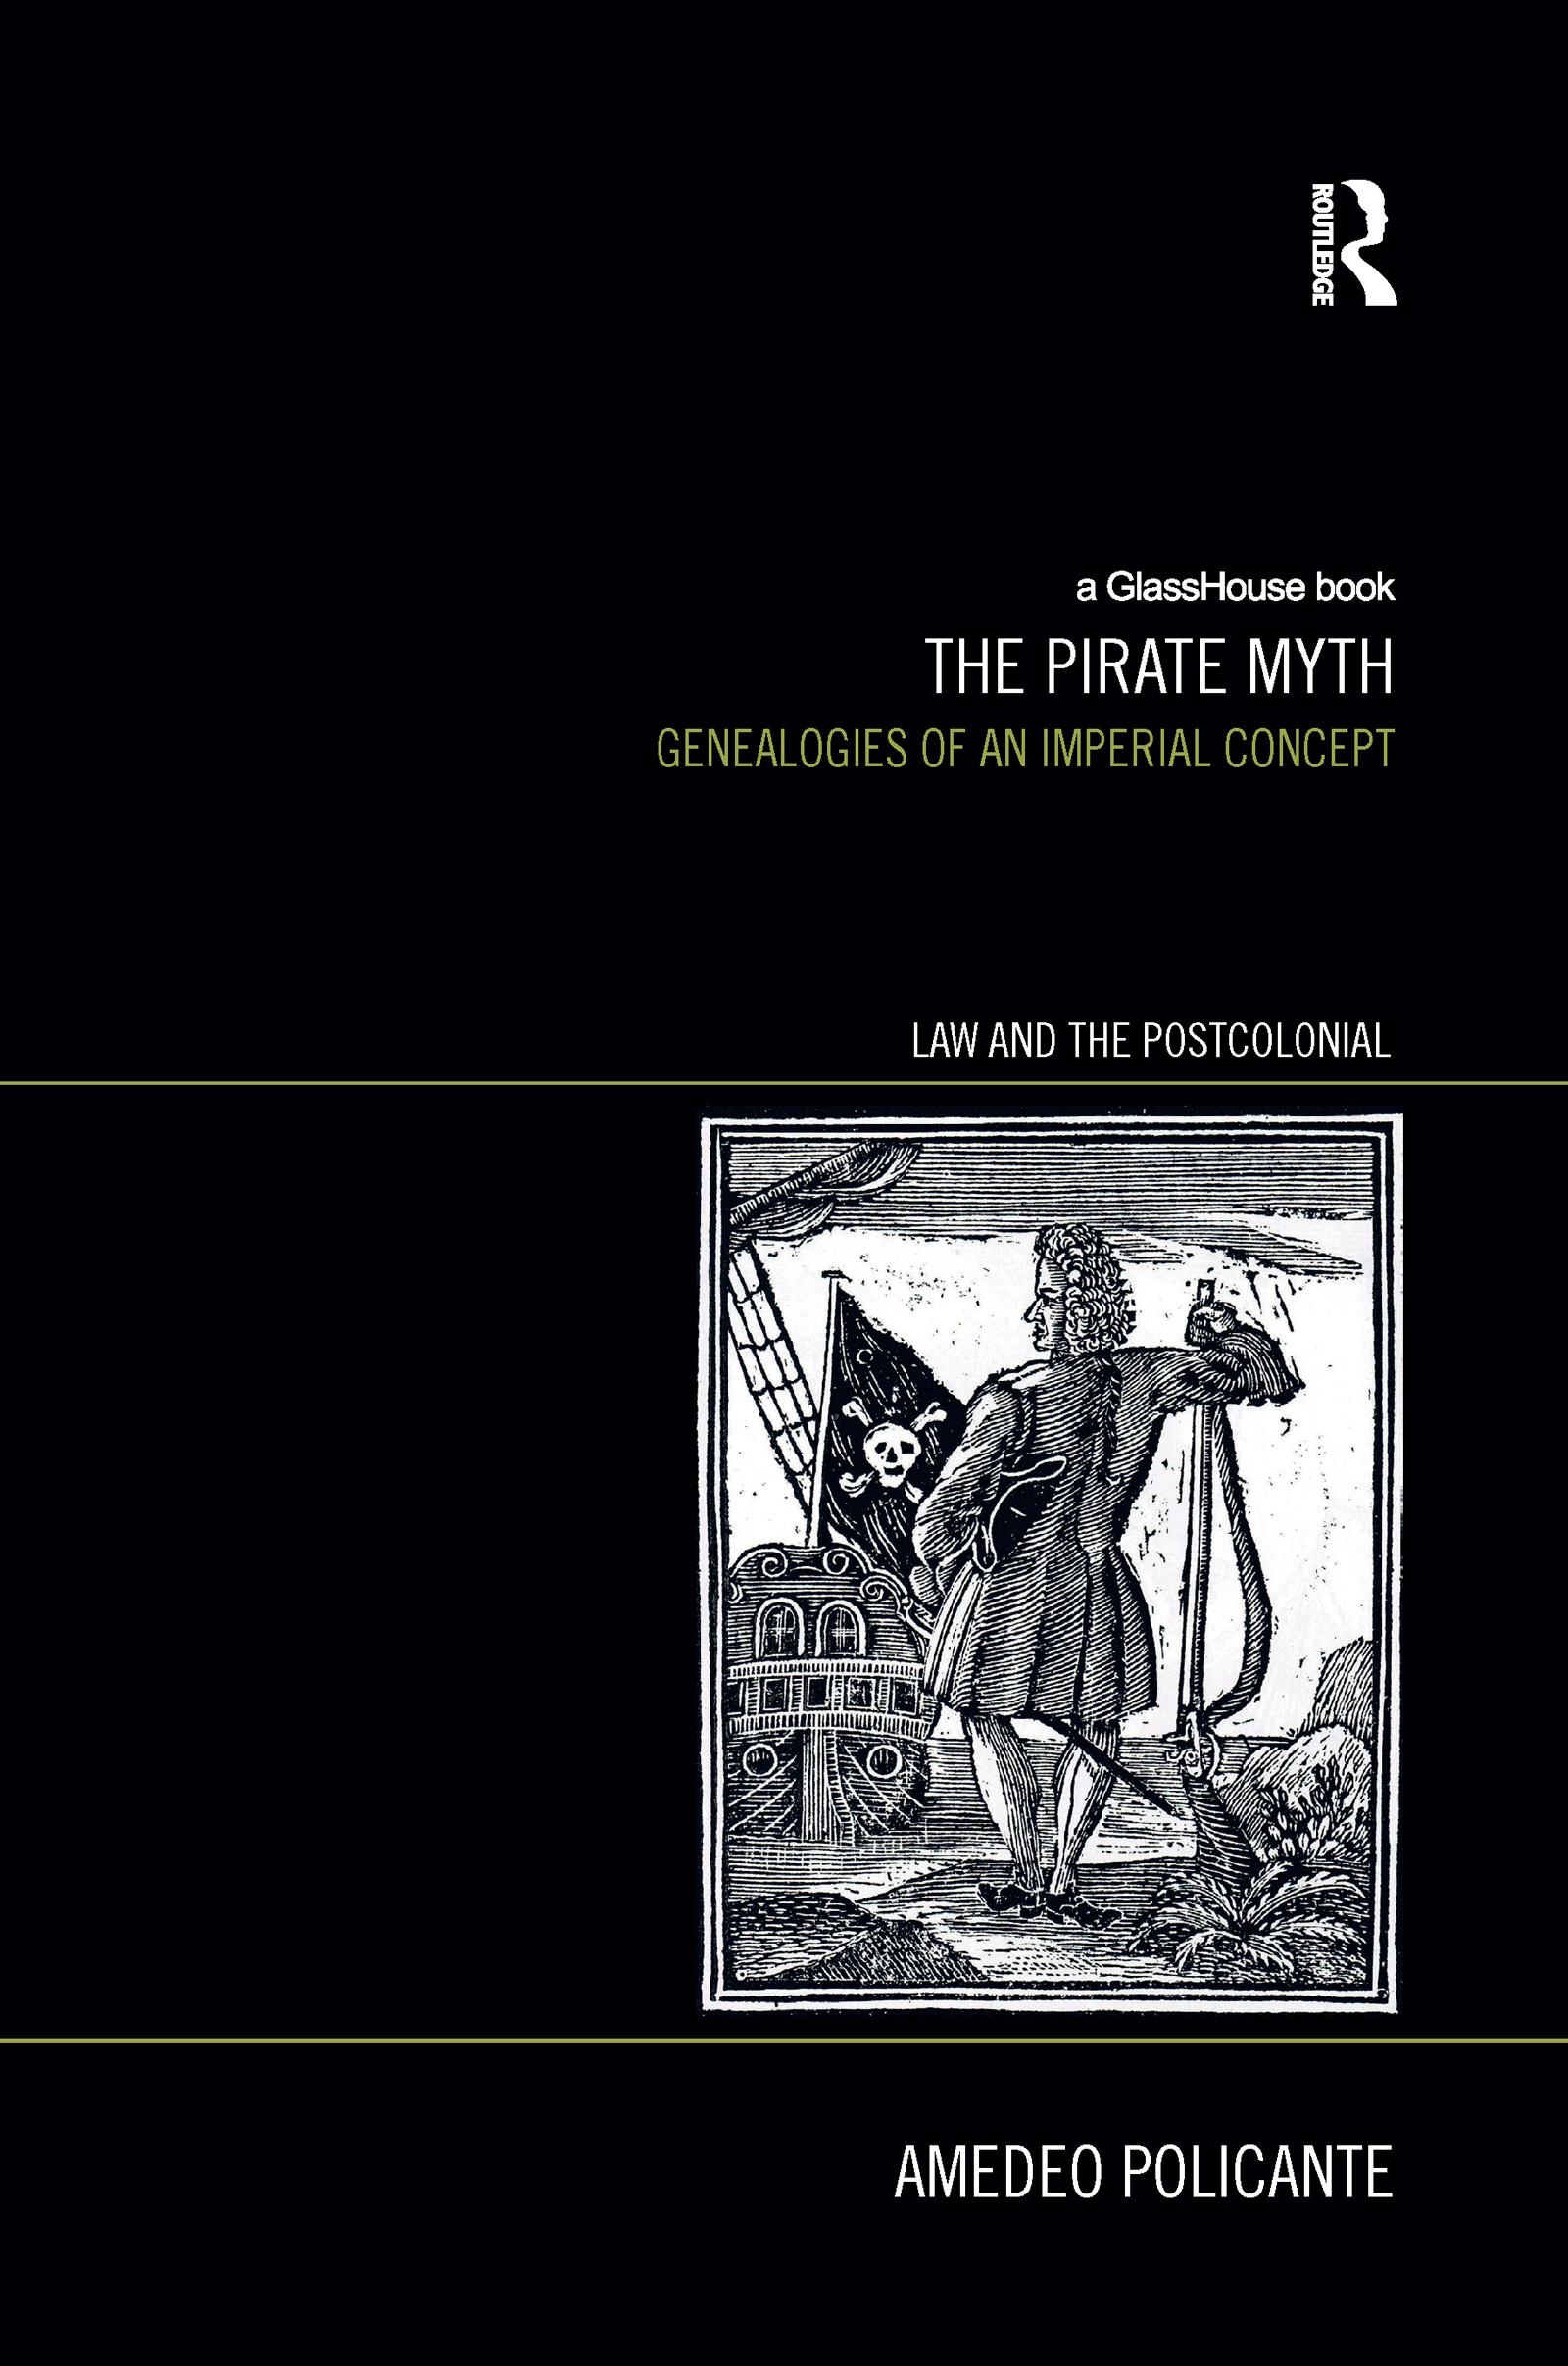 The Pirate Myth